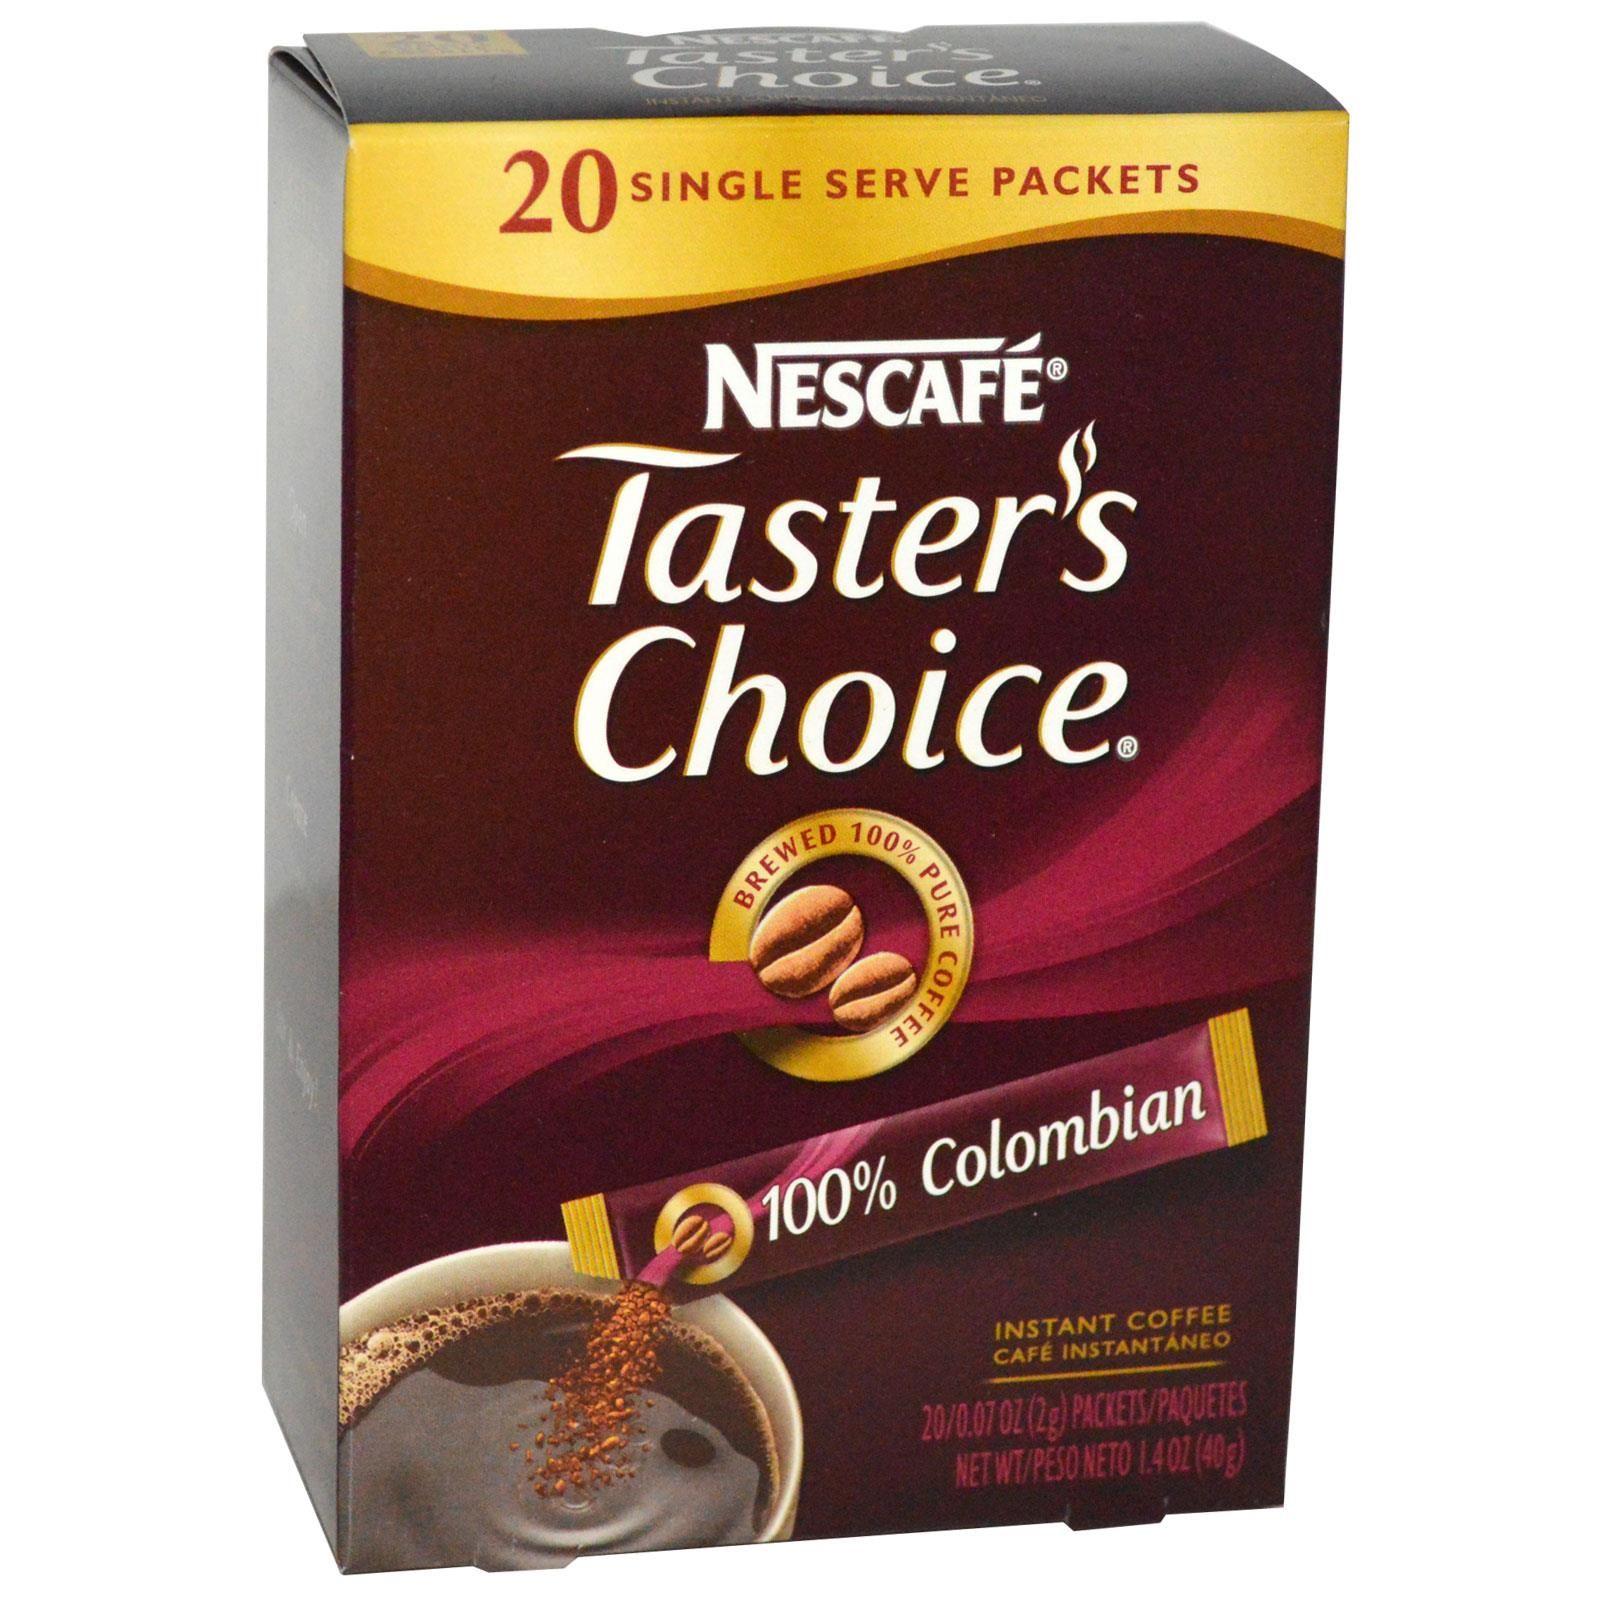 Nescafé, Taster's Choice, Instant Coffee, 100 Colombian